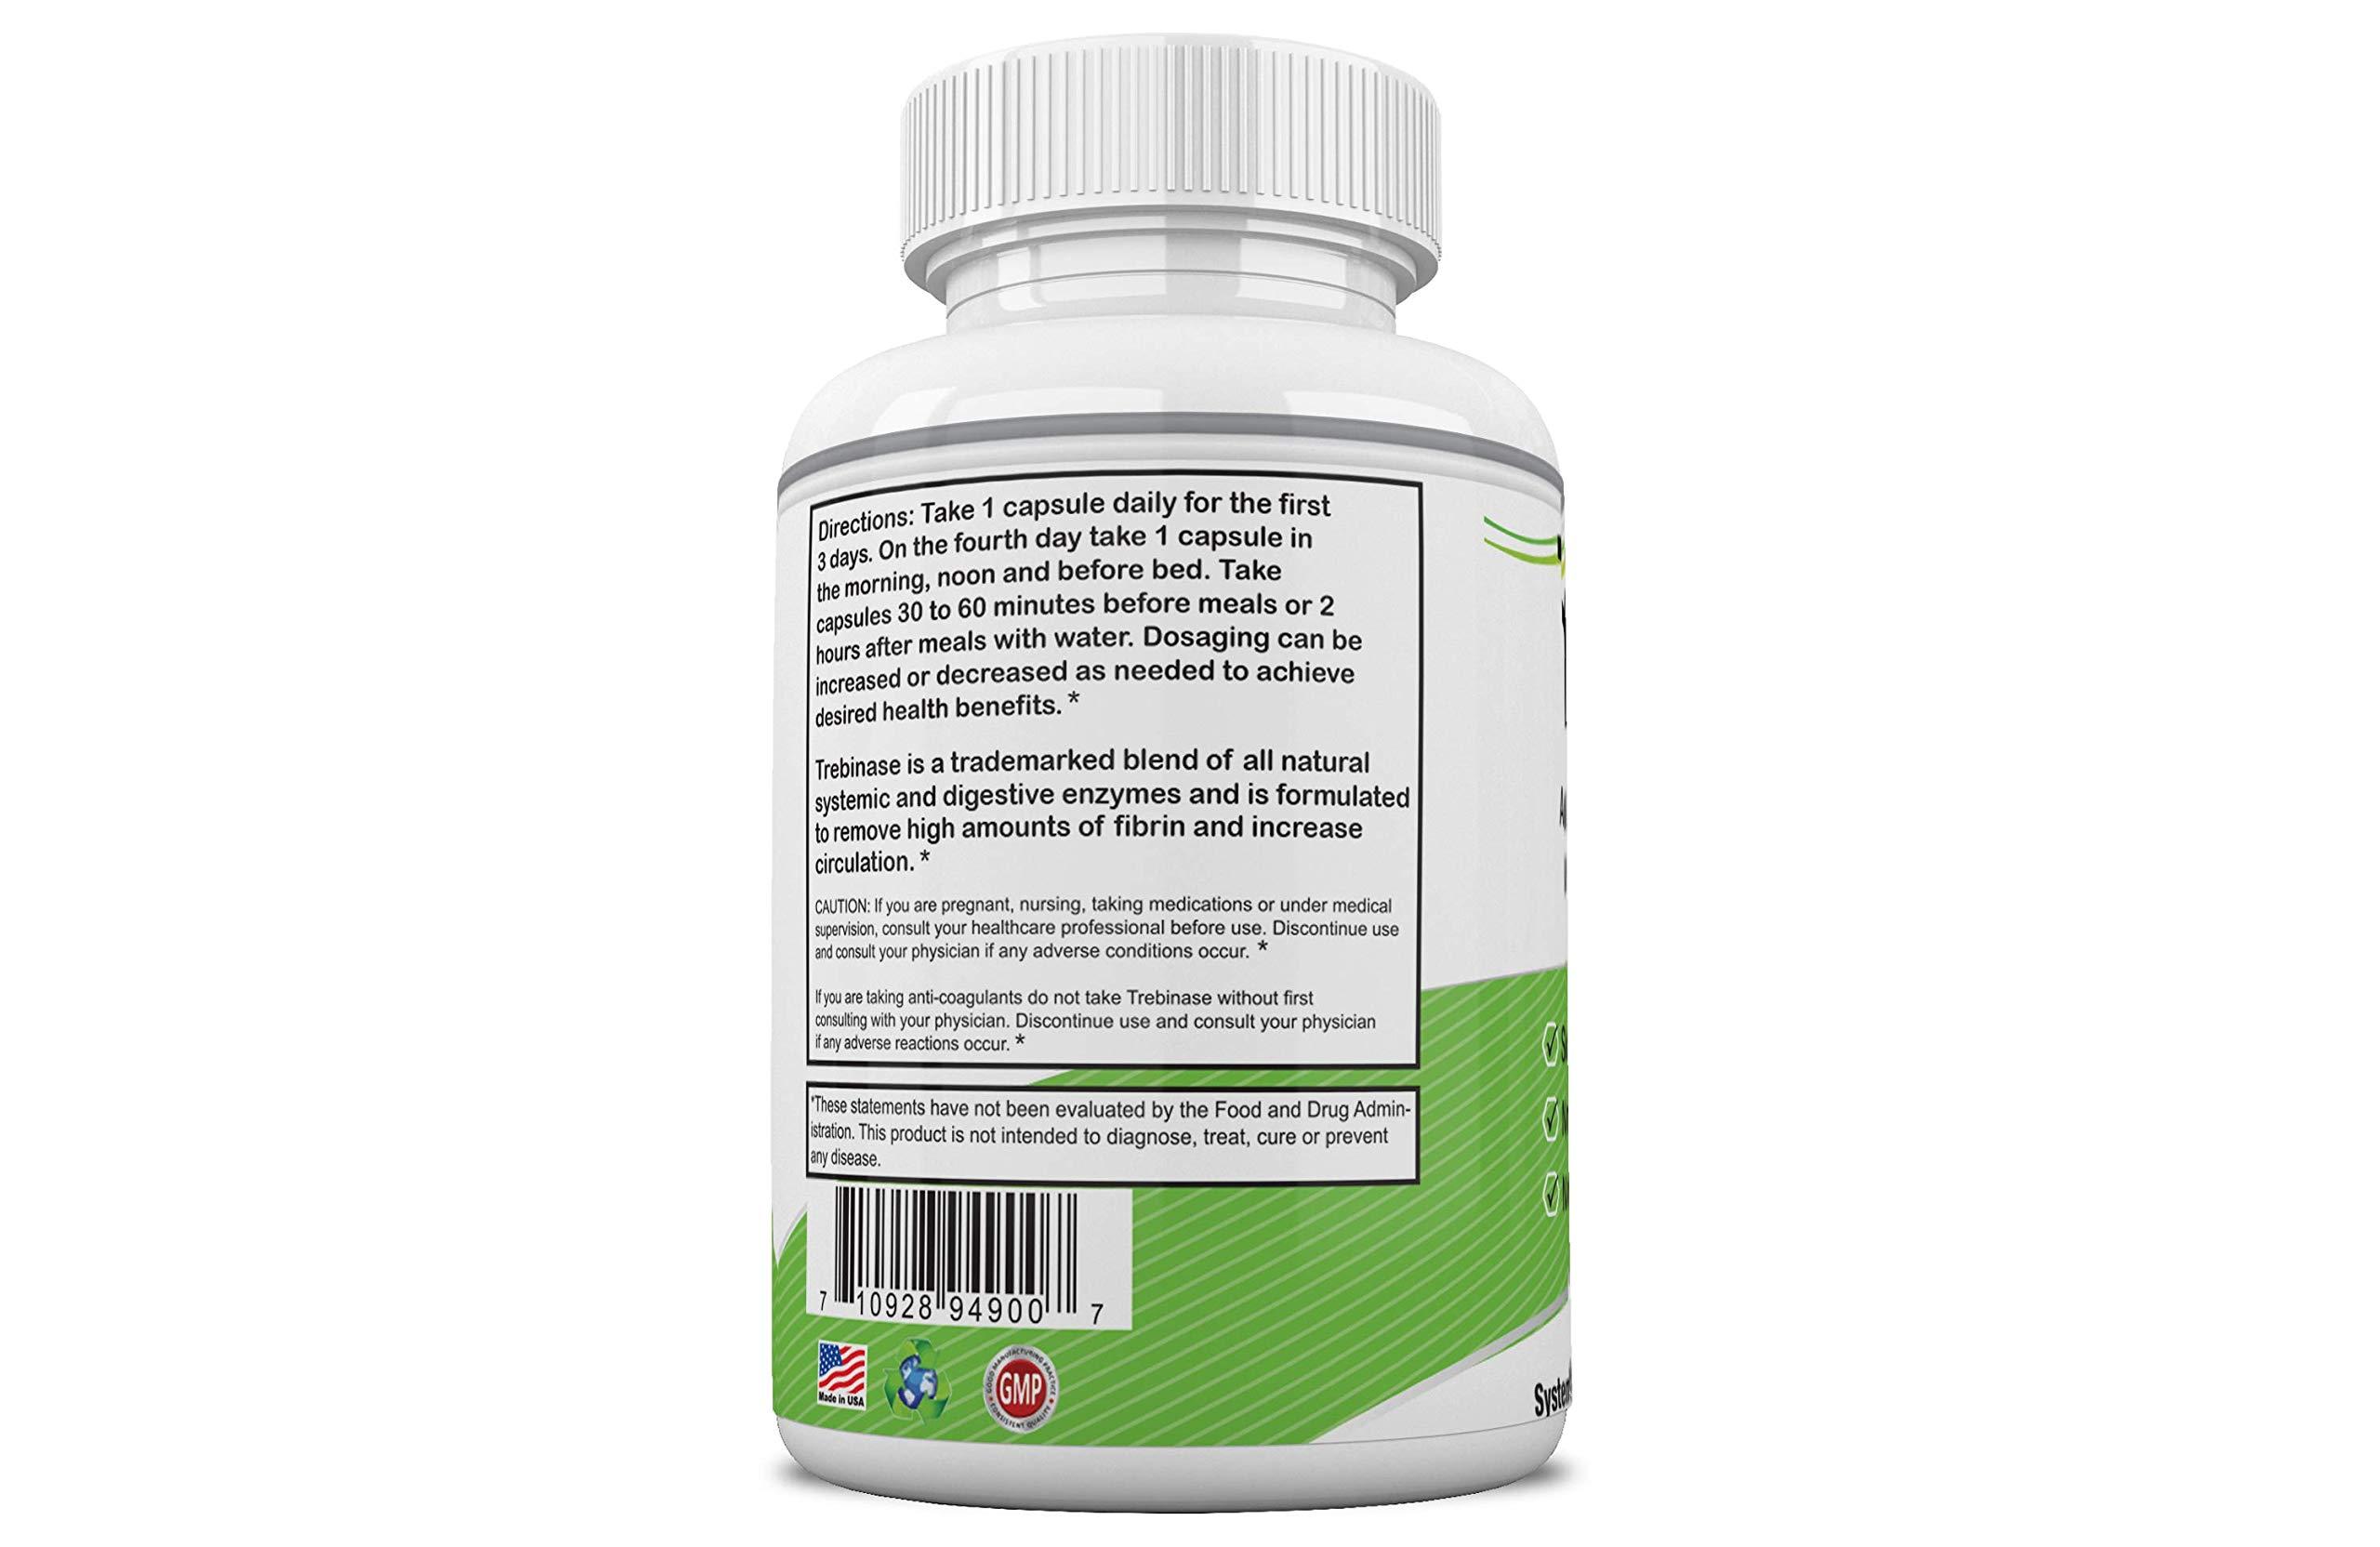 Trebinase 320,000 FU's Per Capsule Advanced Systemic Enzyme Blend of Serrapeptase, Nattokinase & Seaprose Plus Co-Enzymes - Dissolve Scar Tissue Quickly.- 99.99% Pure Pharmaceutical Grade Enzymes by Trebinase (Image #1)